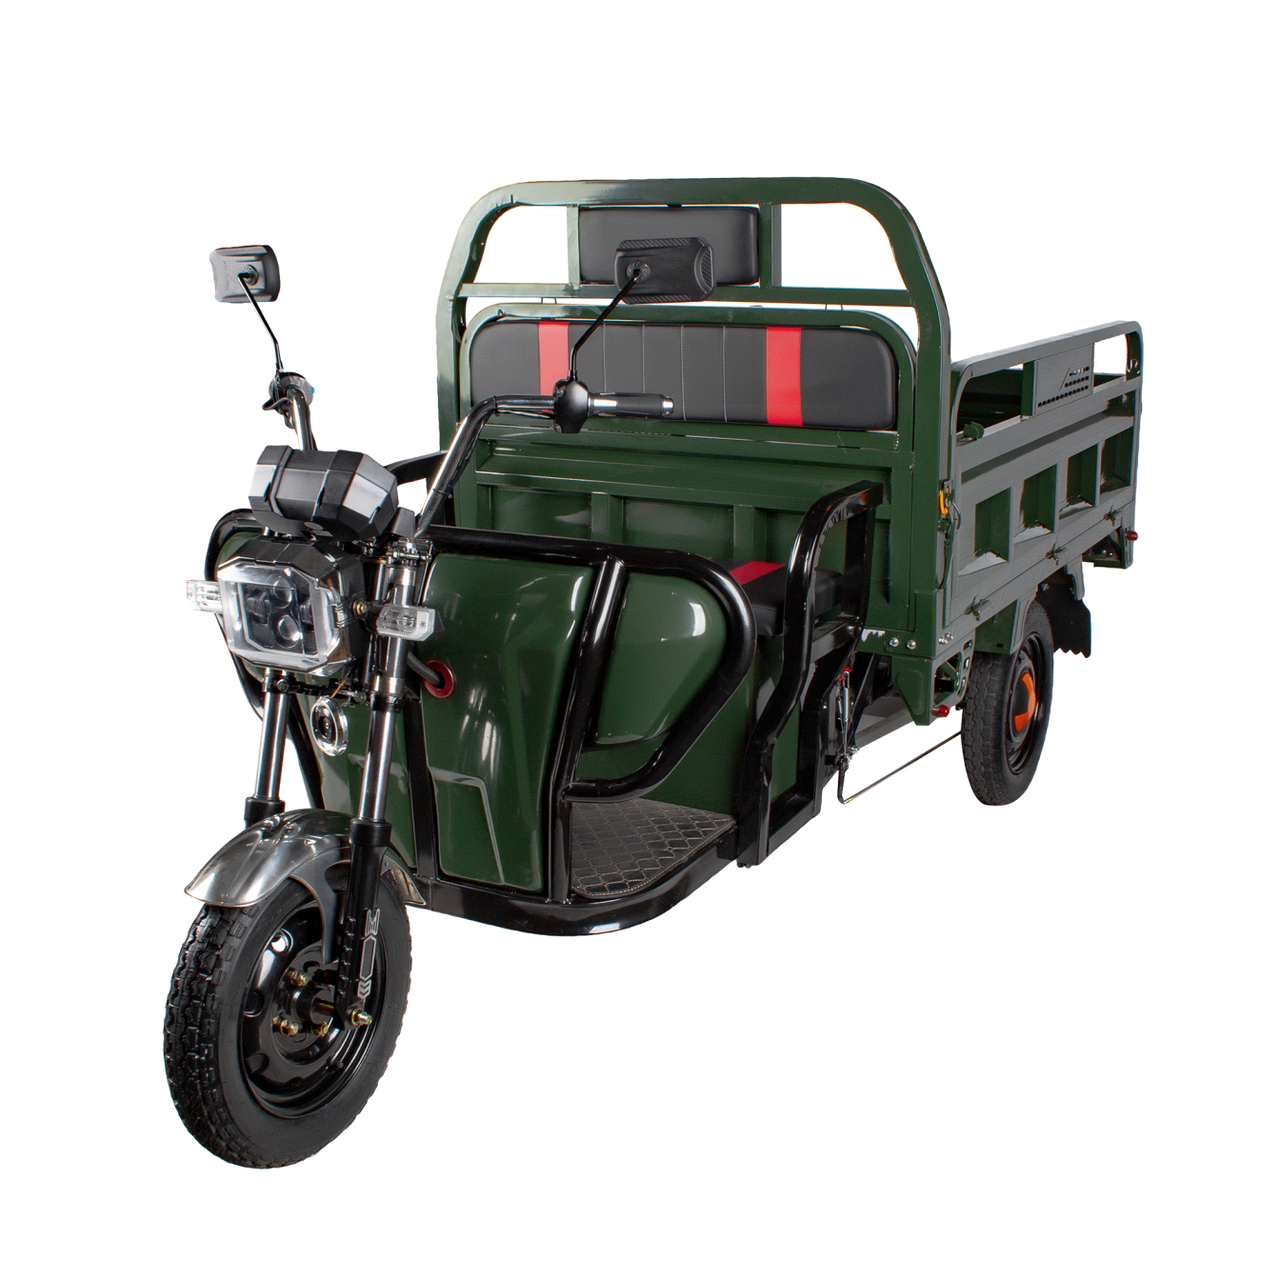 Электрический мопед TRIGO JJ1.6  1000W/60V/50AH(DZM) (зеленый)